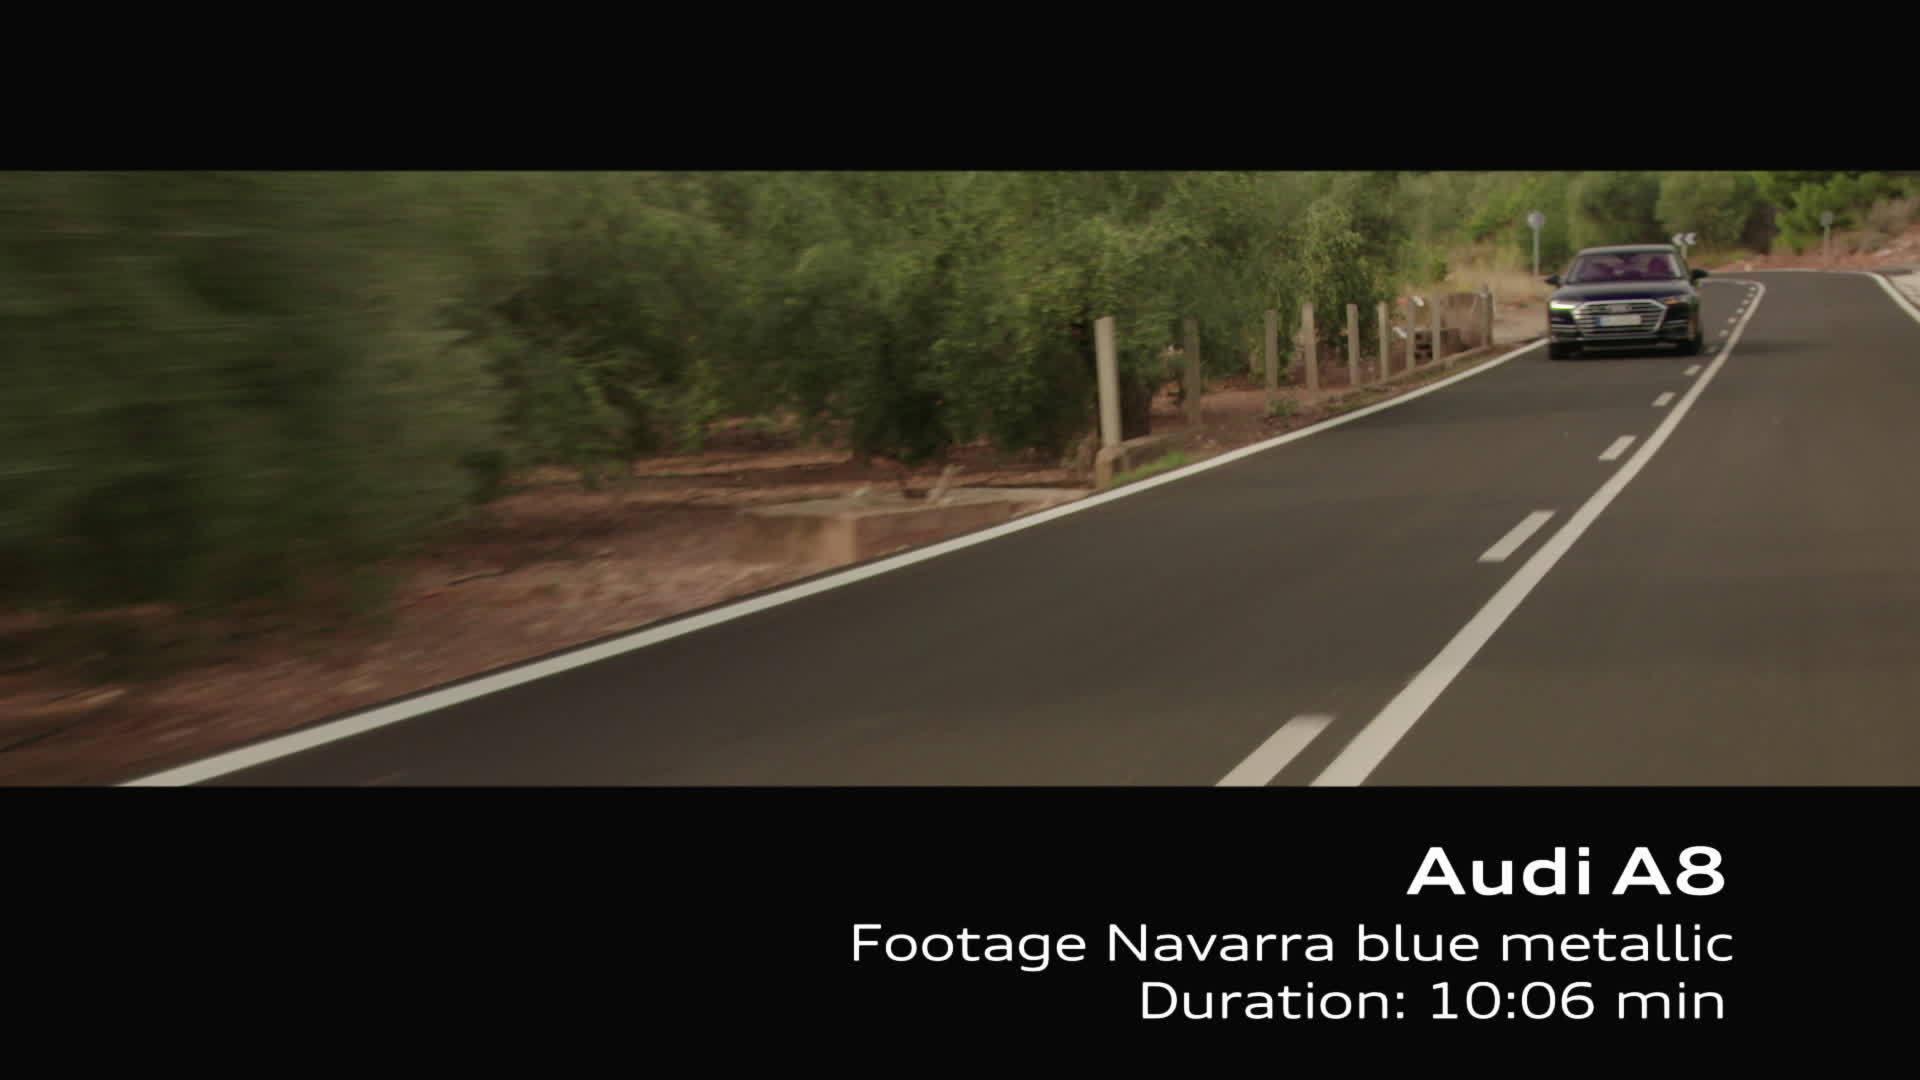 Footage Audi A8 on Location